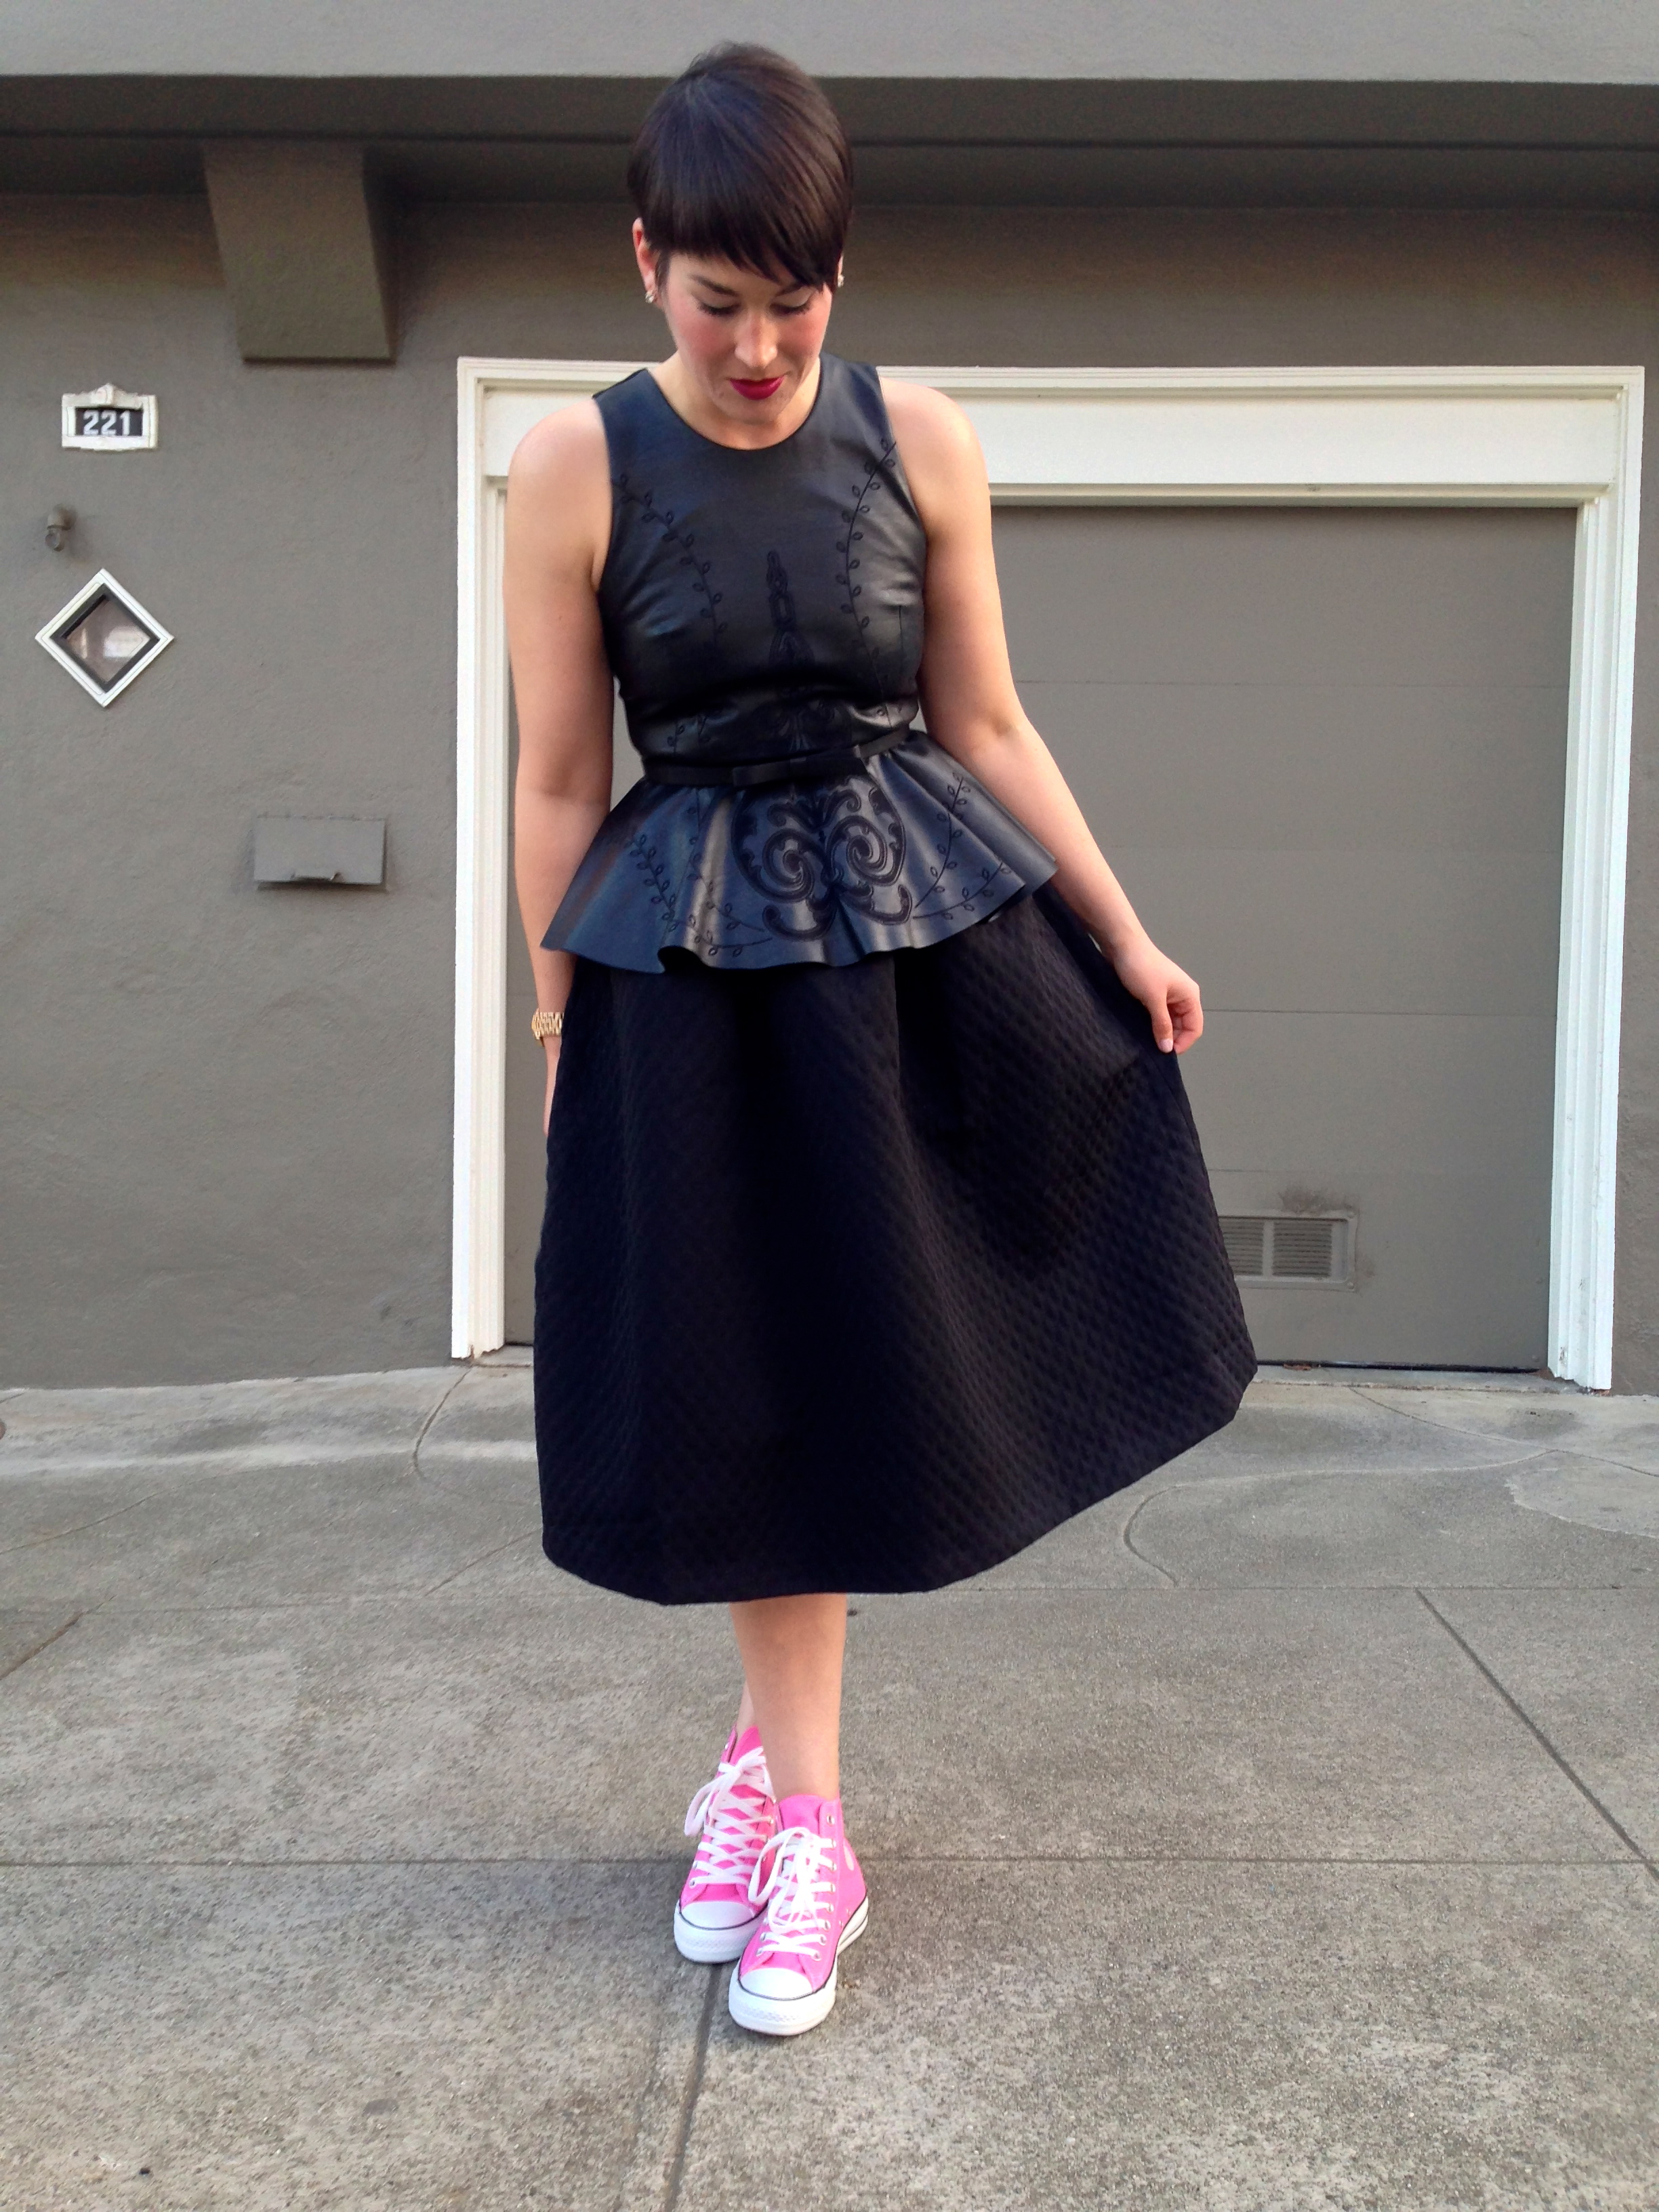 converse pink outfit getraenkeschnellkaufde